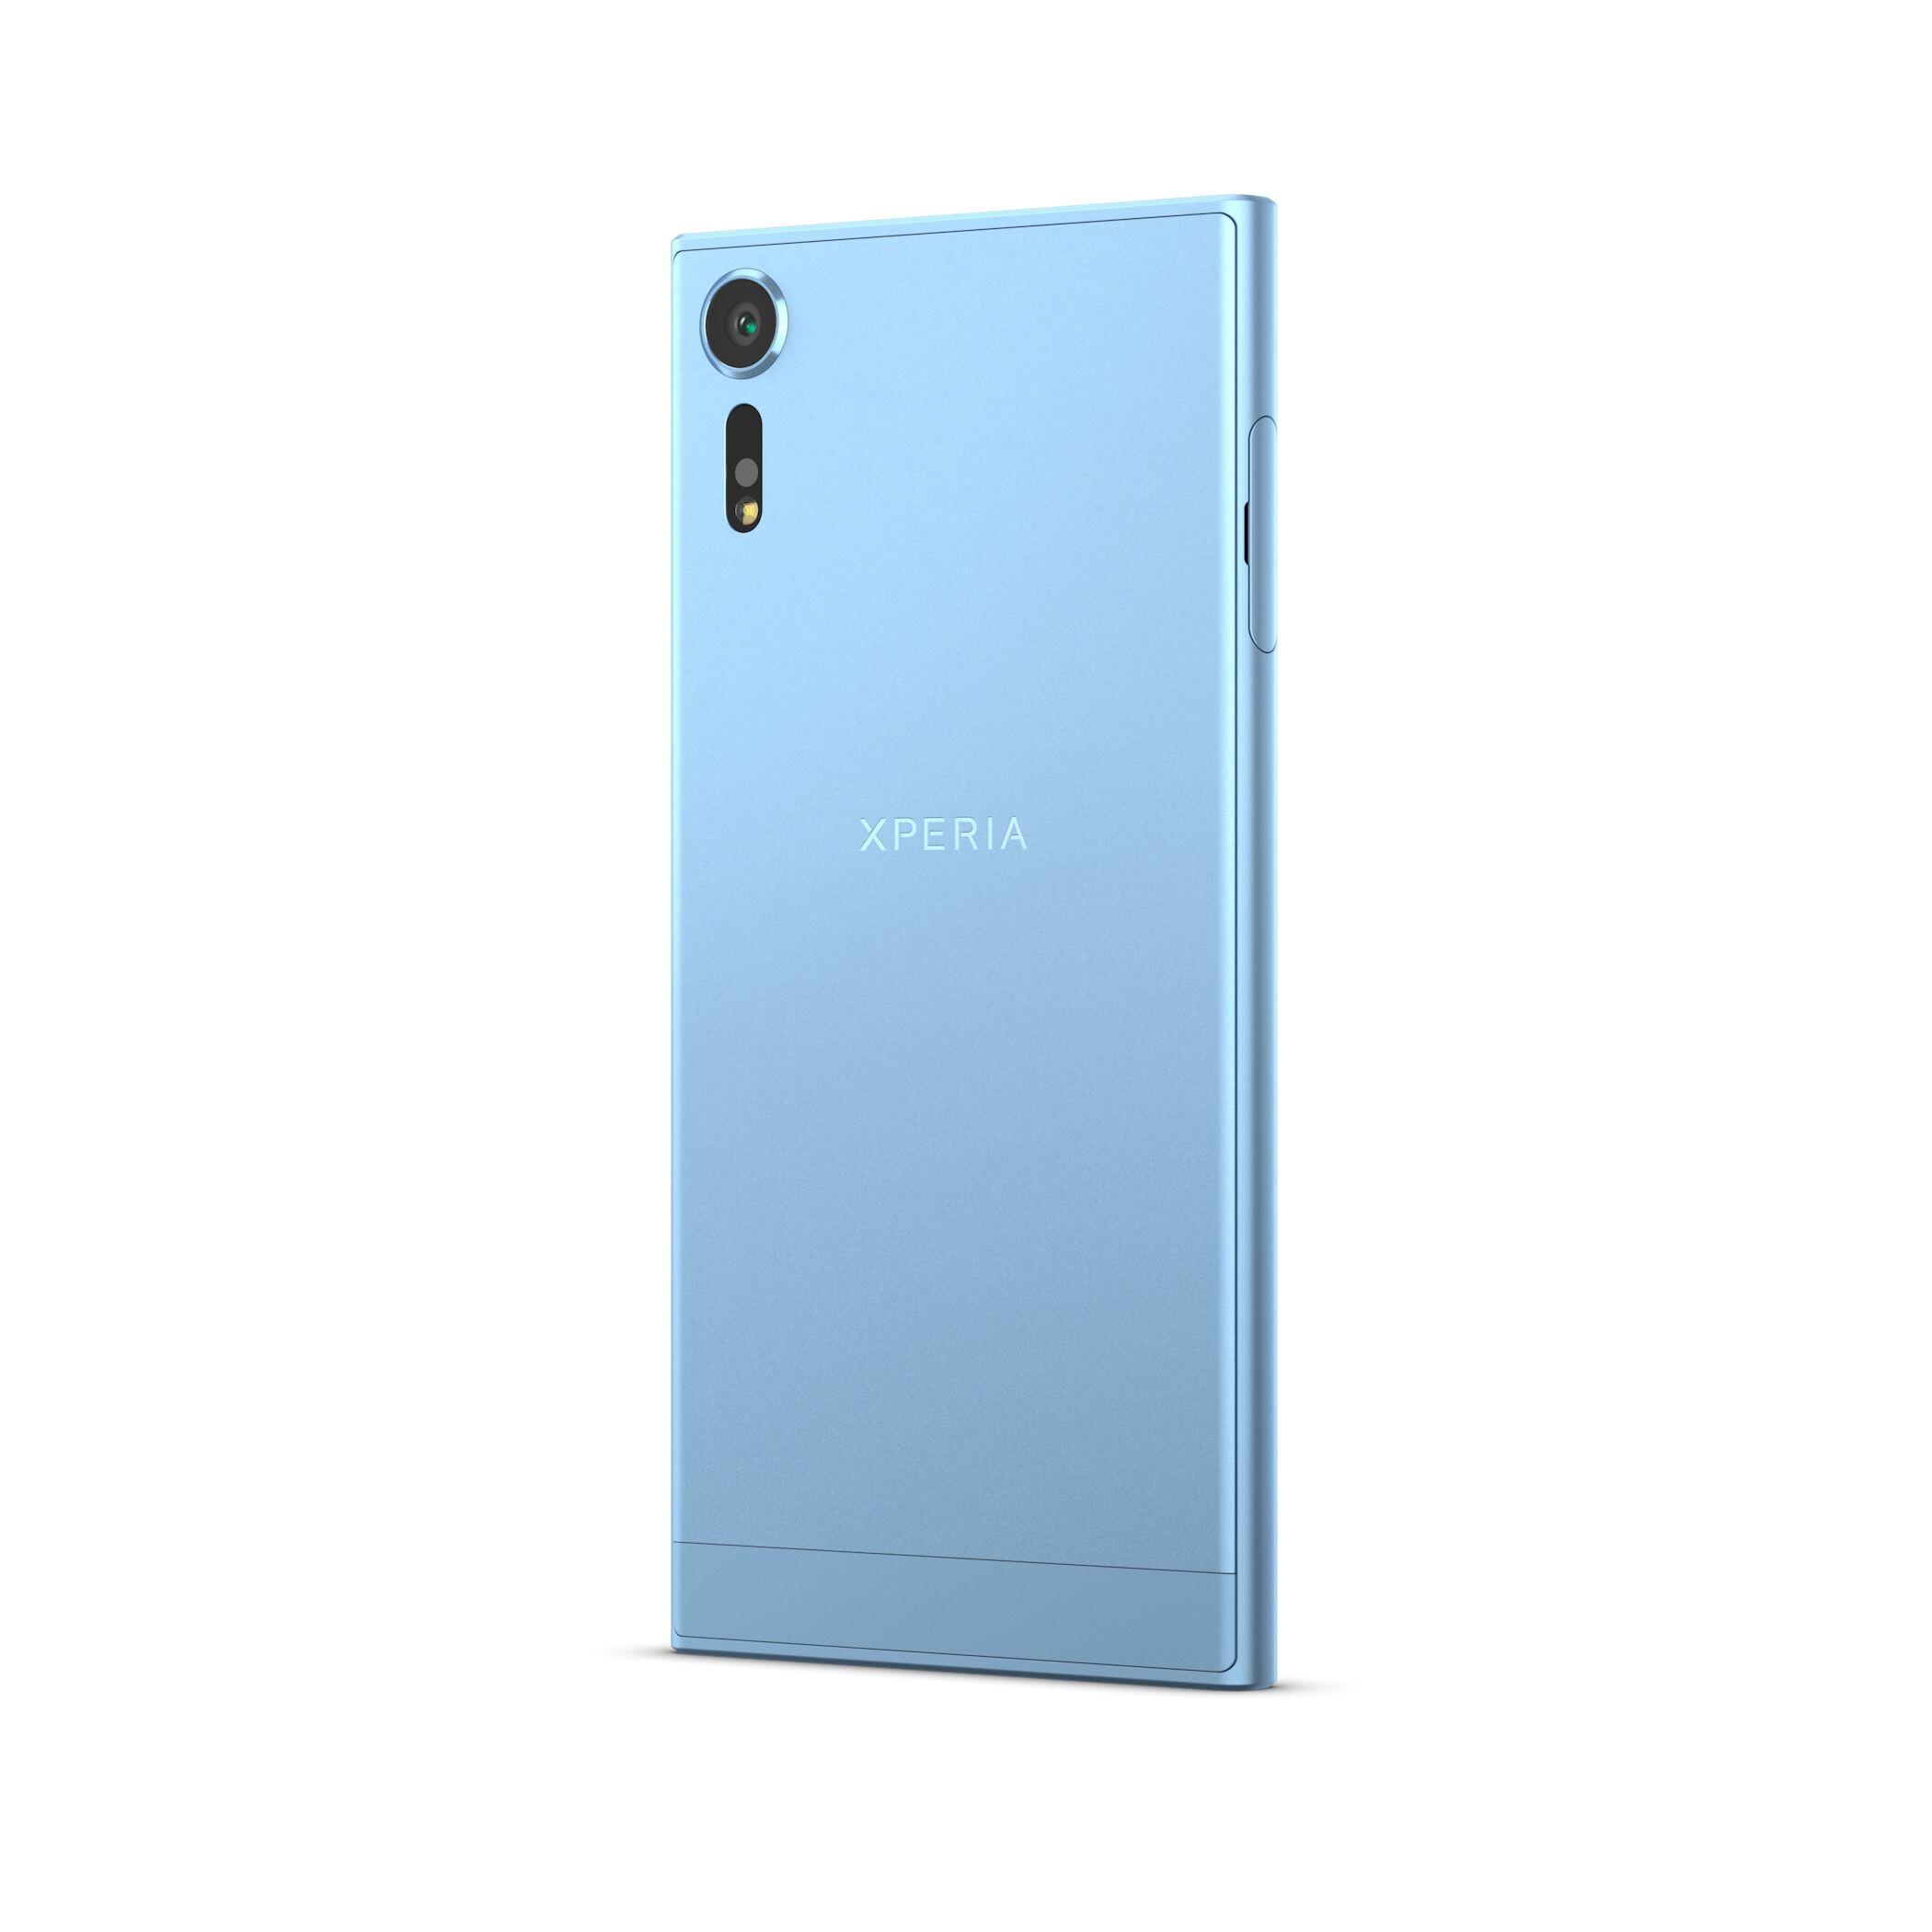 xperia xzs vs iphone 7plus